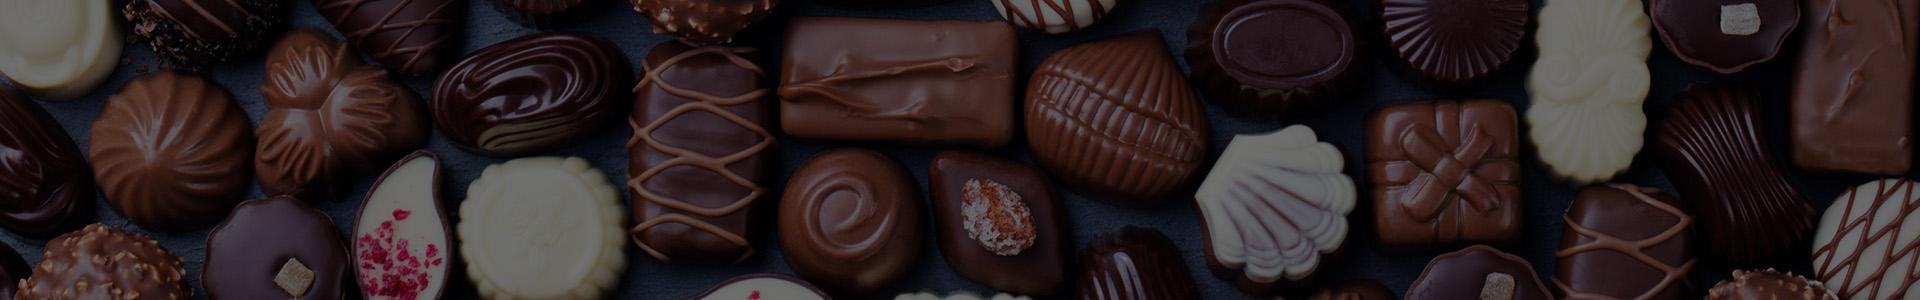 czekoladki - banner